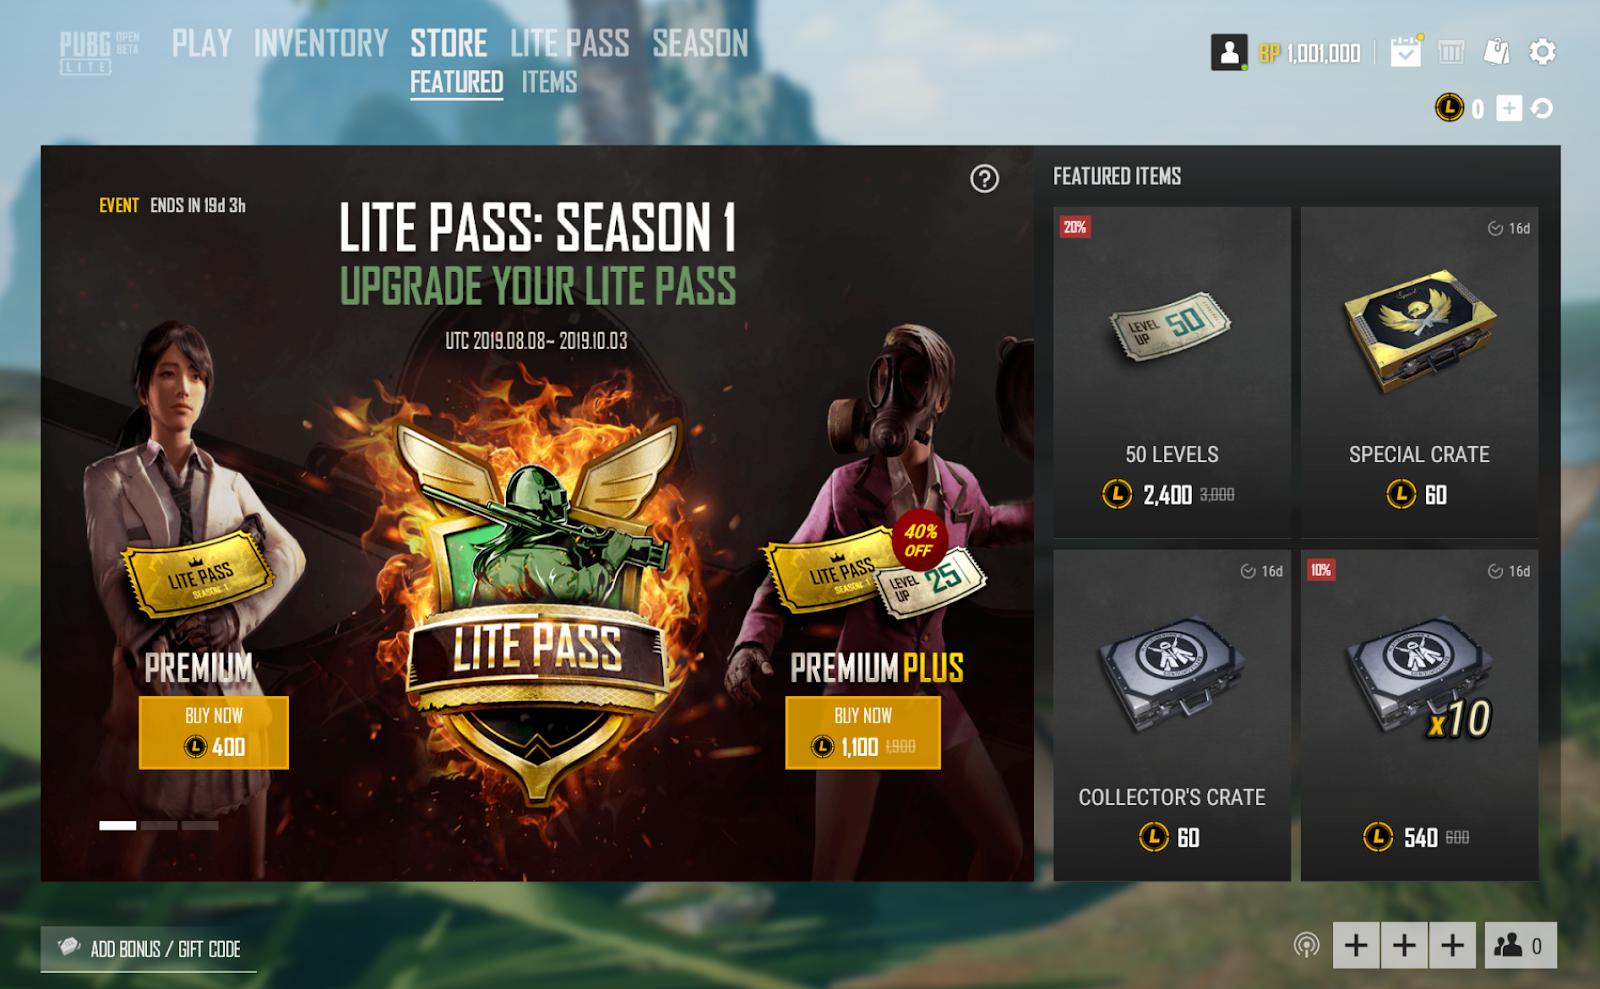 https://lite.pubg.com/wp-content/uploads/2019/08/lite-pass-rewards-04.png